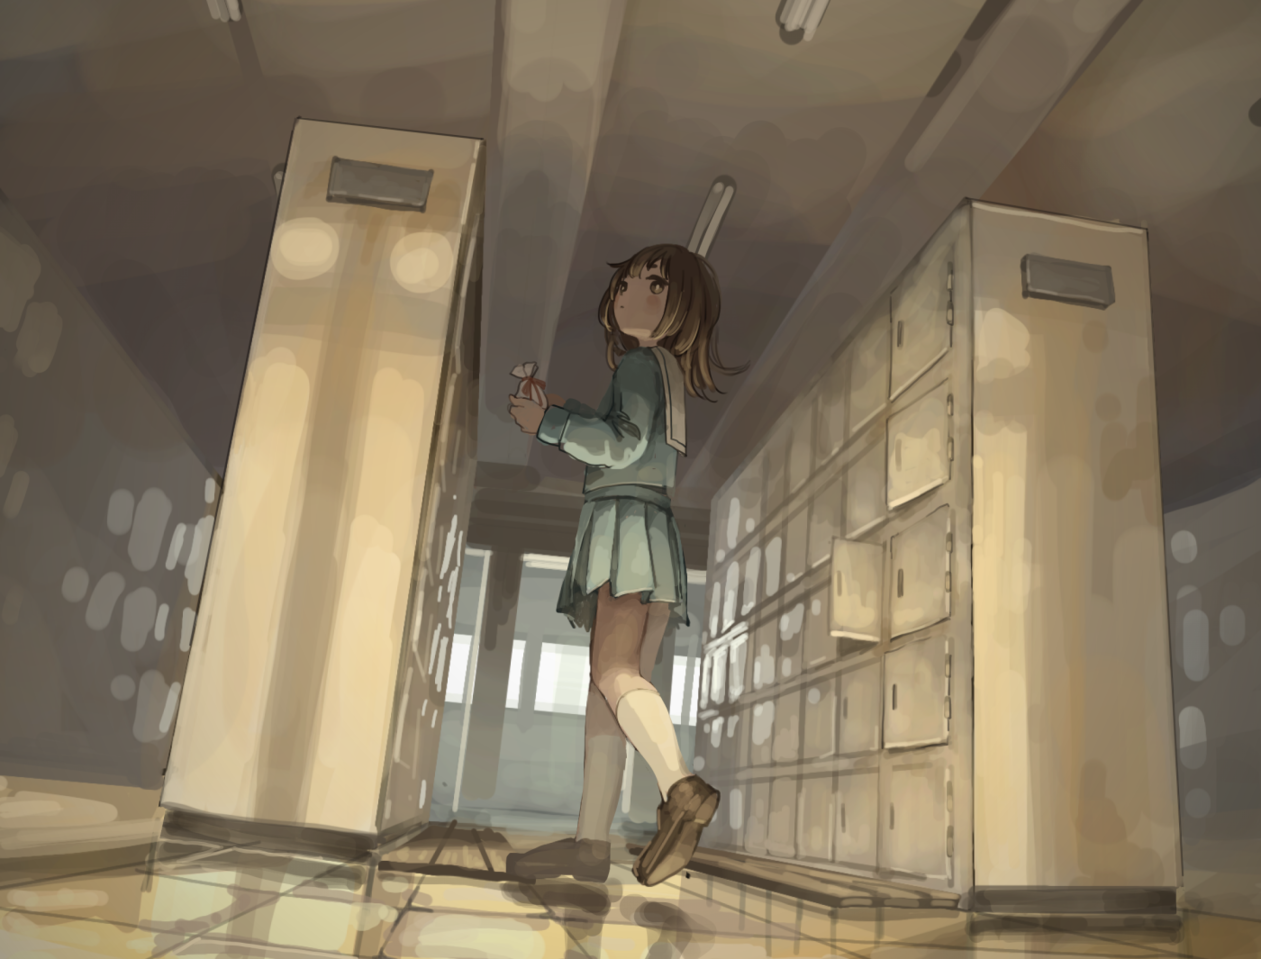 Illust of tnsn Feb2020:VDAY sailor_uniform 女子高生 girl